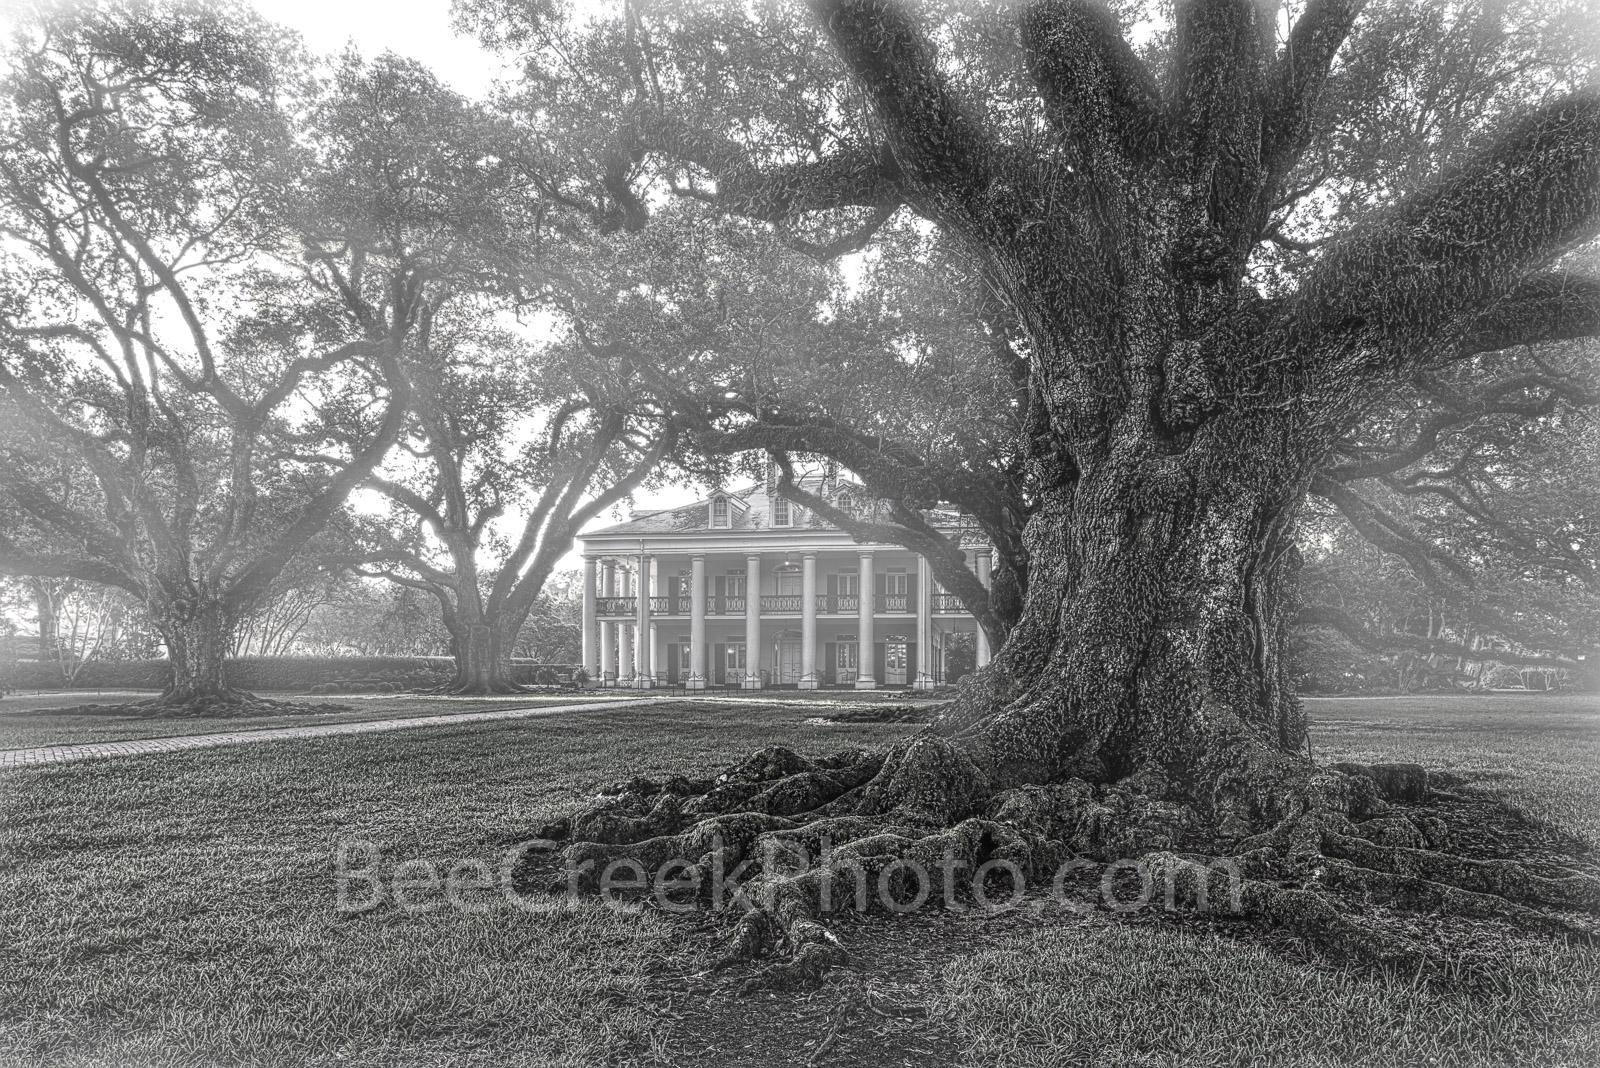 Oak Alley Plantation, black and white, bw, live oak trees, plantation oaks, slavery, deep south, southern, oak valley, seven oaks, mansion, big house, movies, Mississipp river, Vacherie, St James Pari